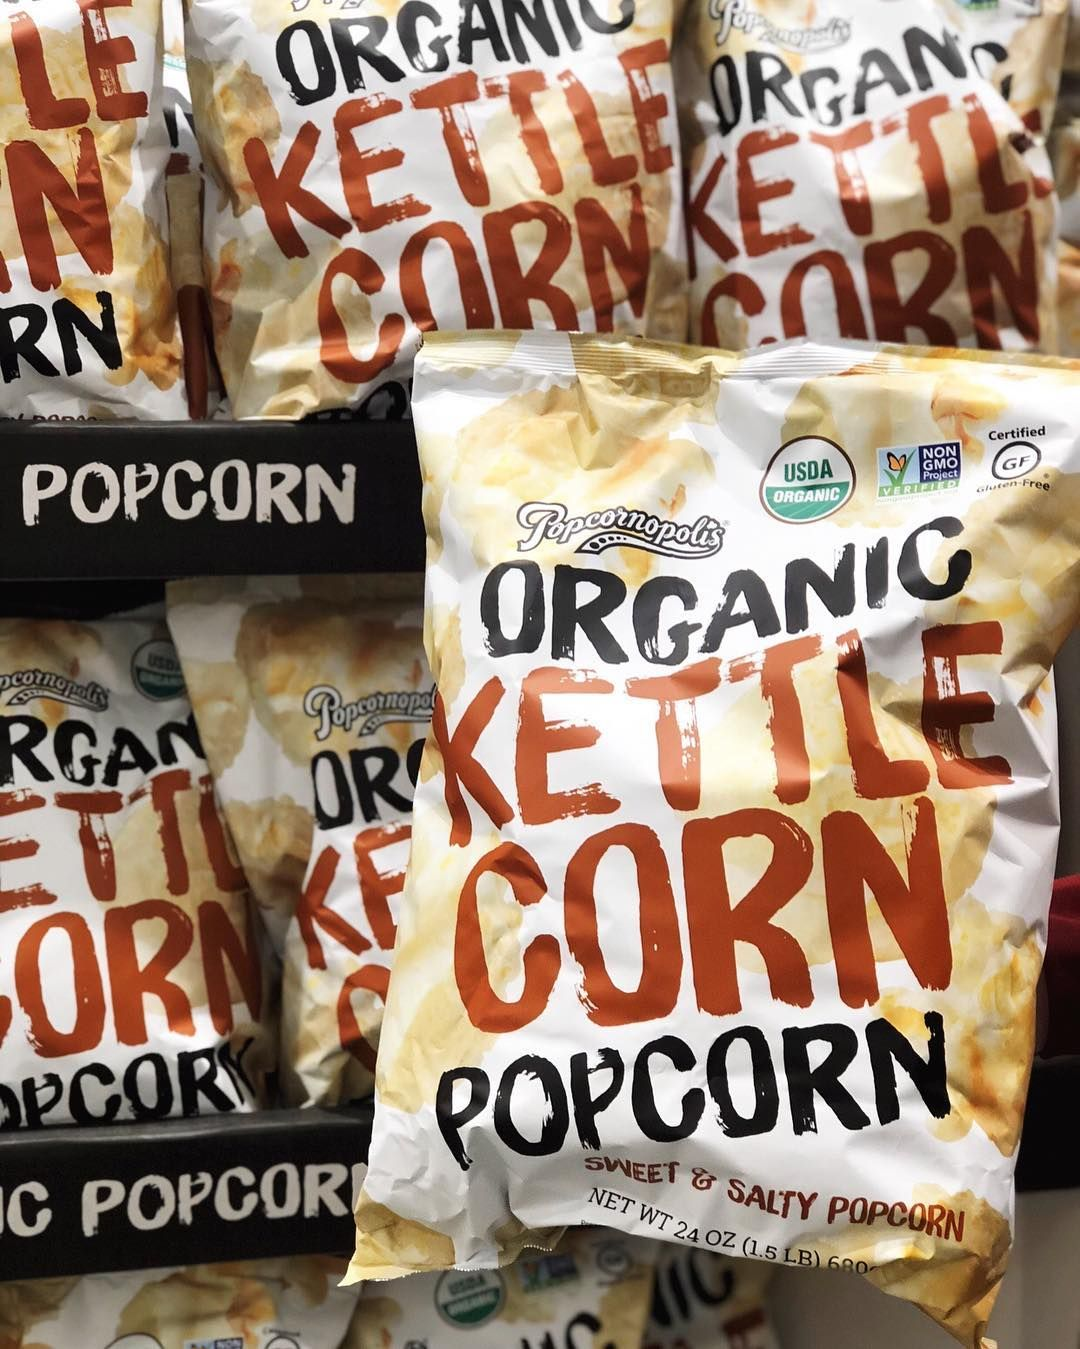 organic kettle corn popcorn at costco